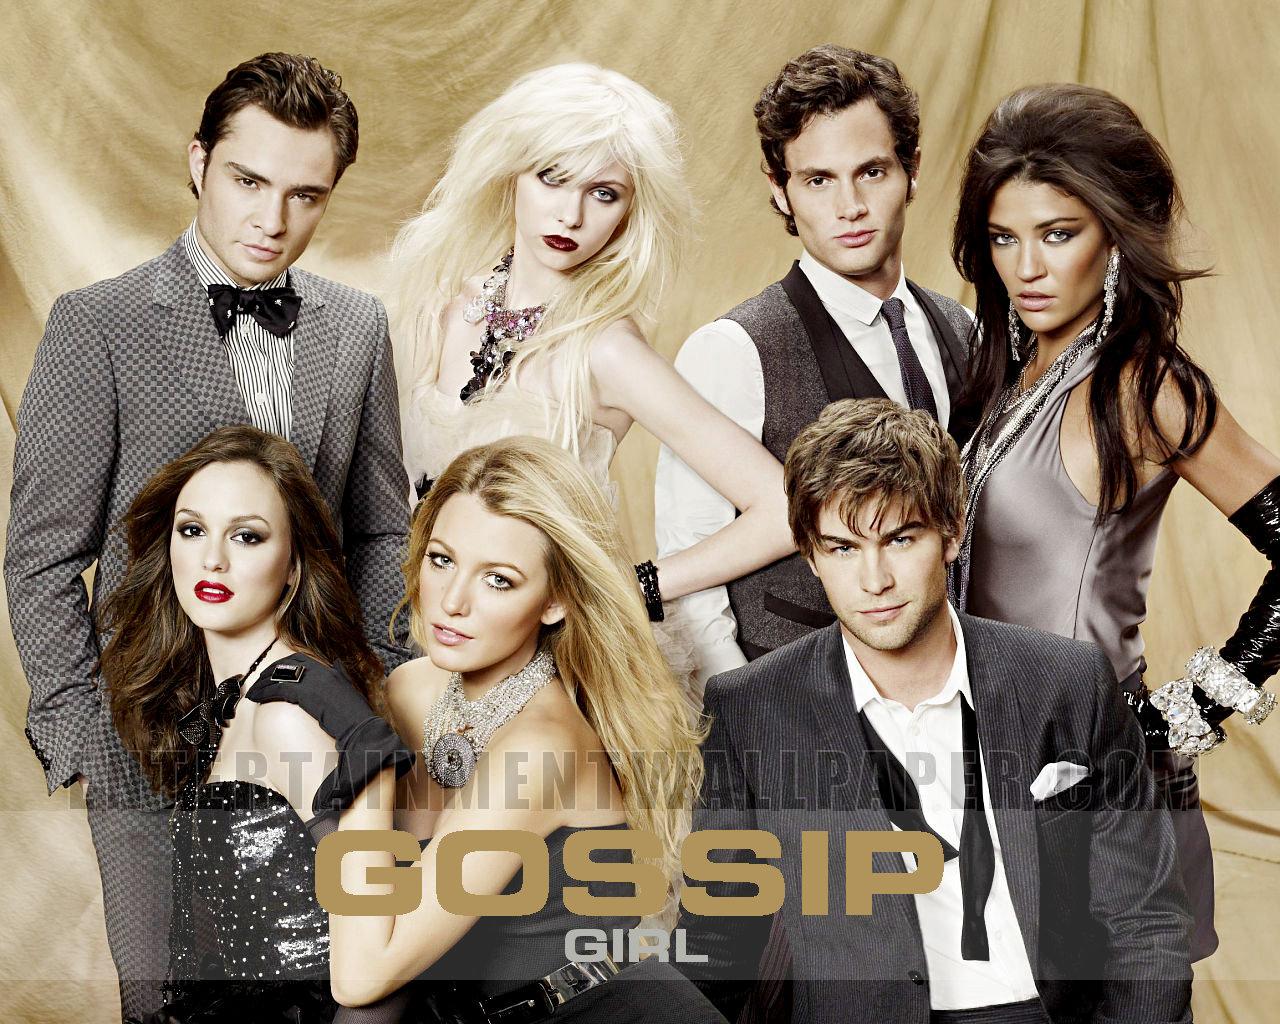 gossip girl cast season 3 episode 12